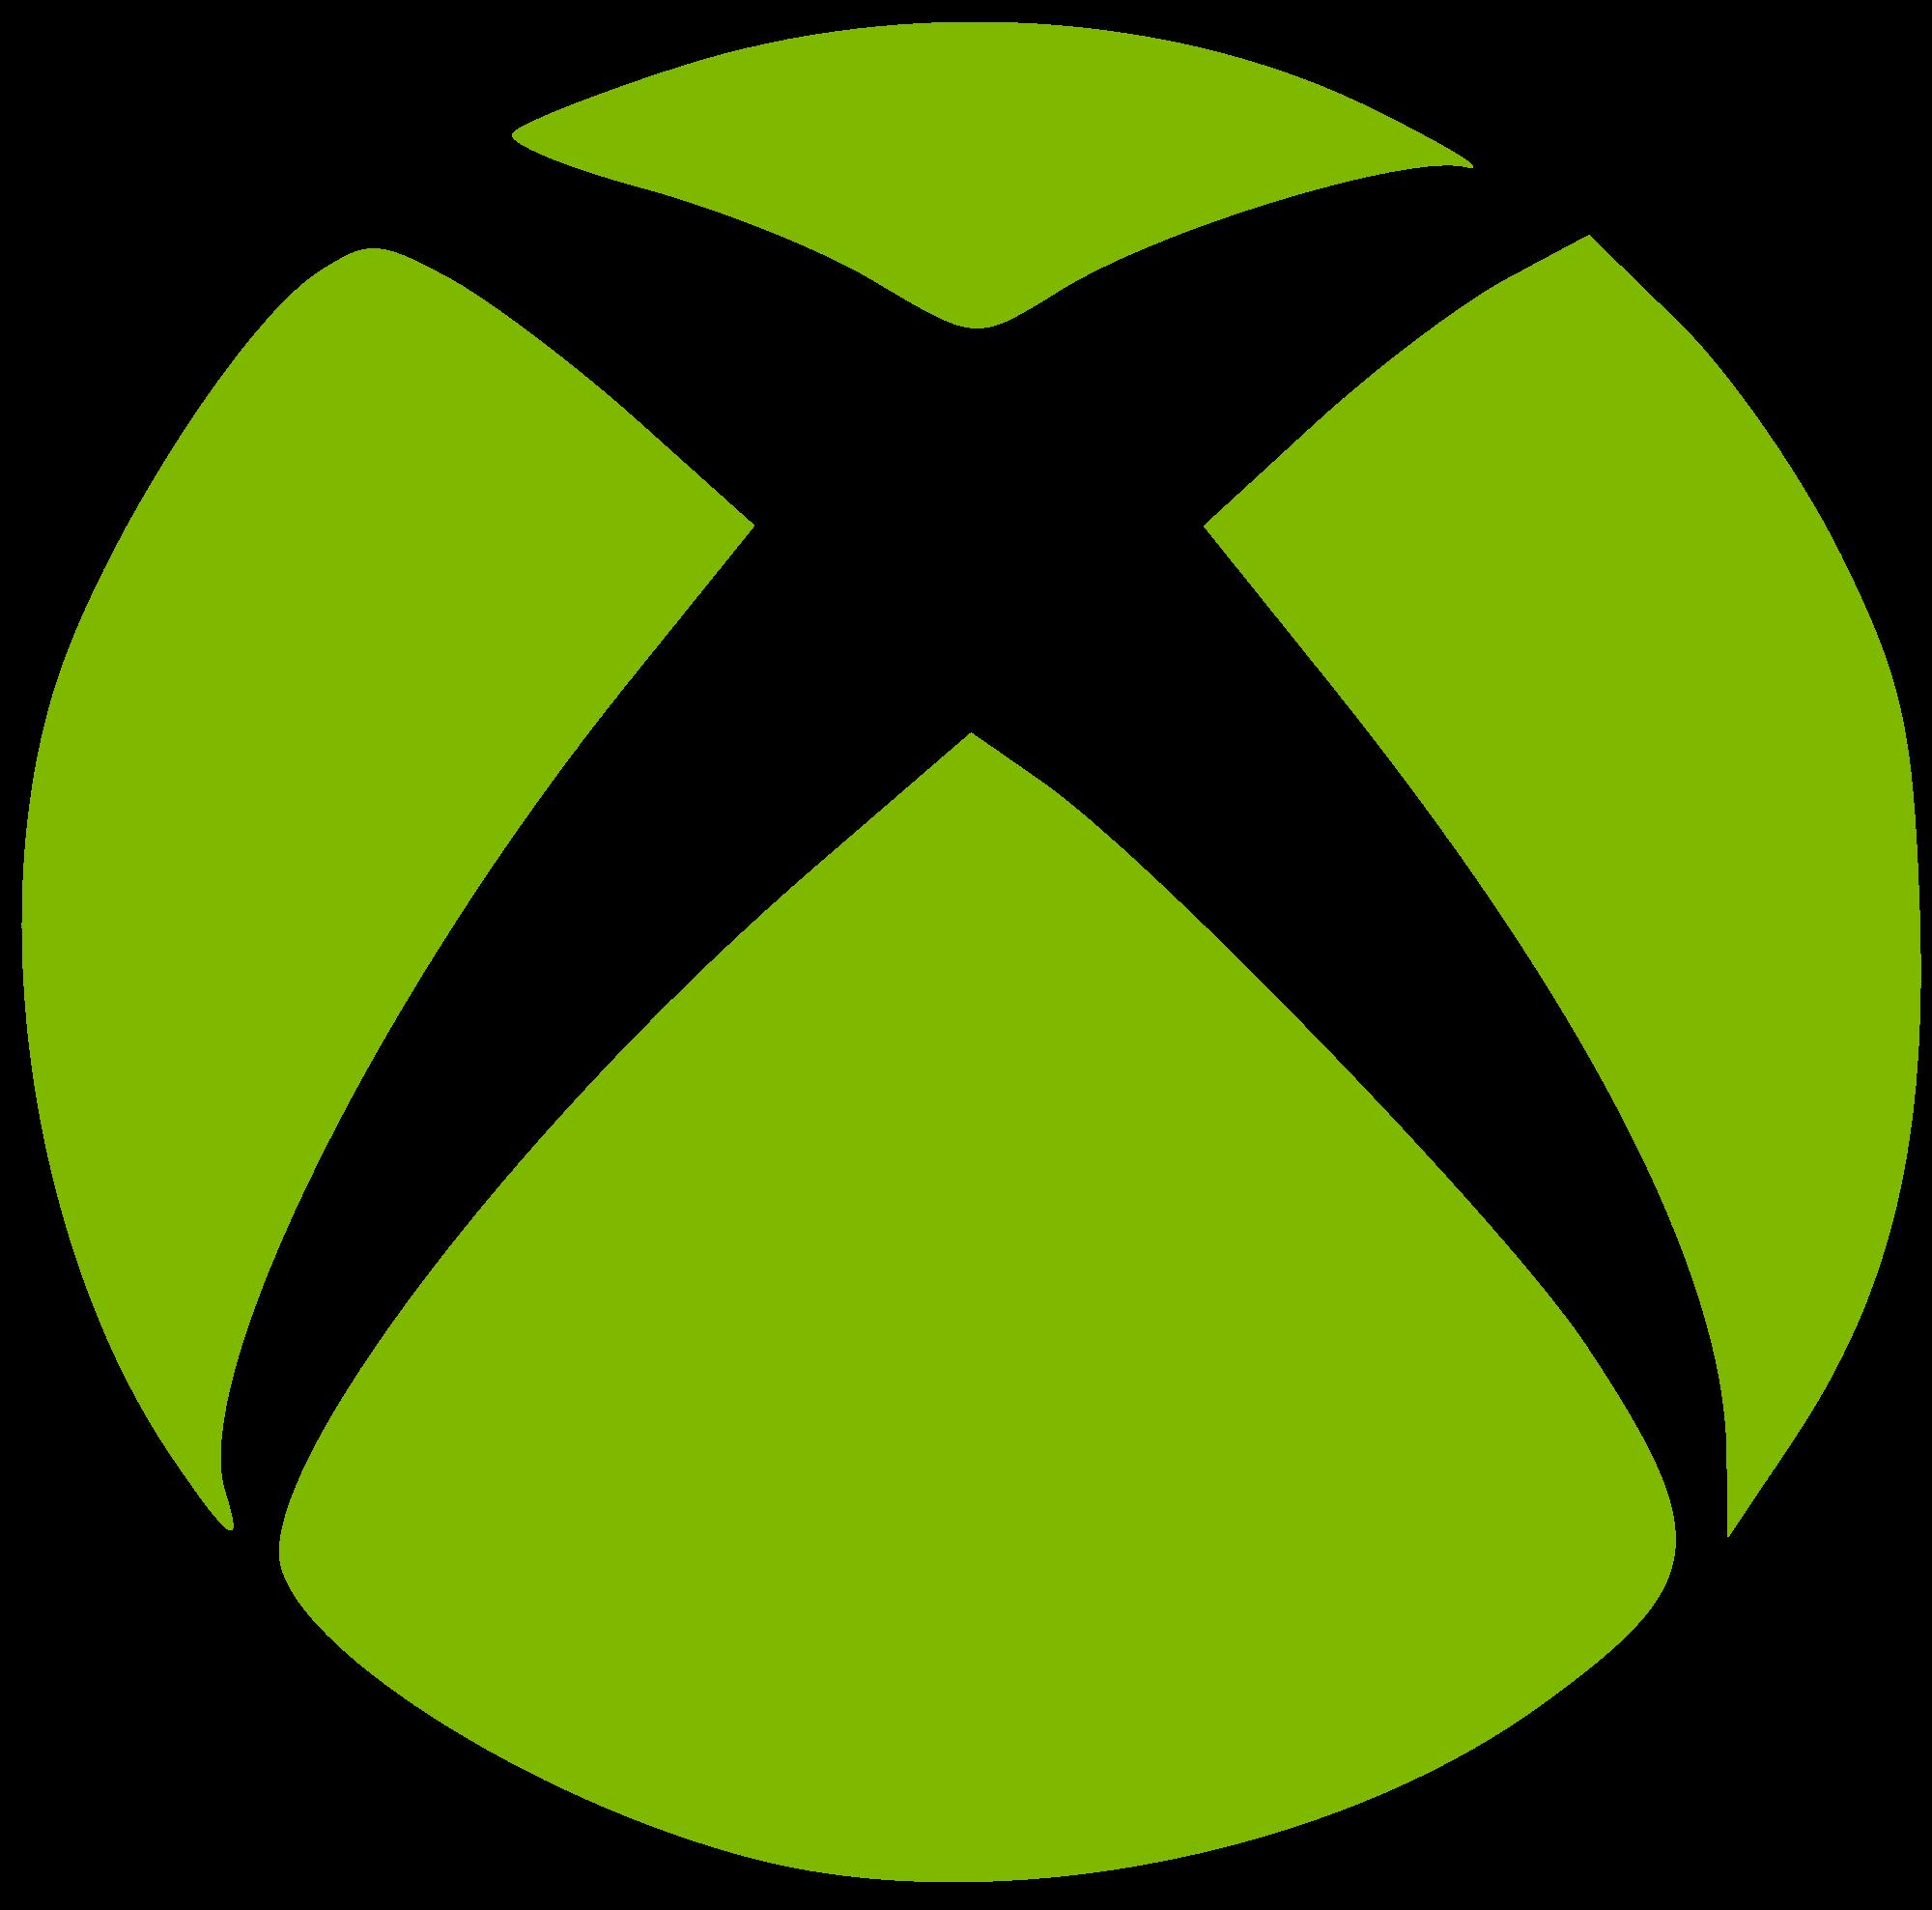 Xbox Logo Png Image Purepng Free Transparent Cc0 Png Image Library Xbox png transparent xbox.png images. xbox logo png image purepng free